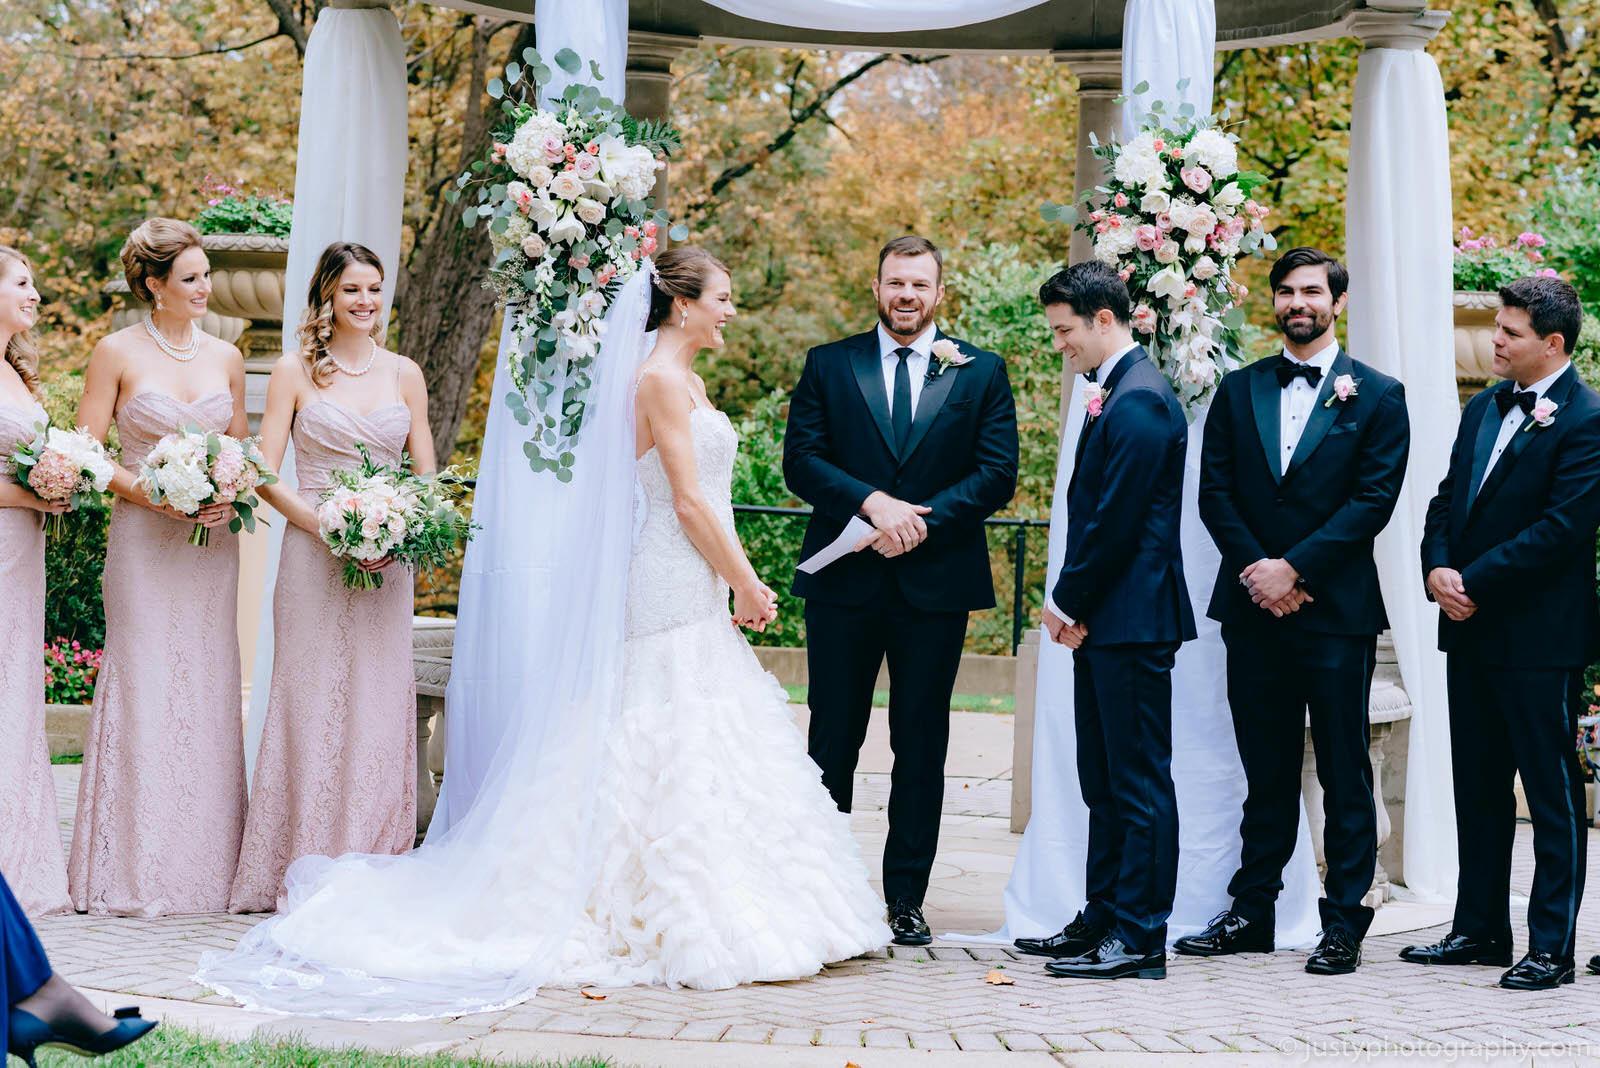 Omni Shoreham wedding photos-washington-dc-wedding-venues (115 of 171).jpg